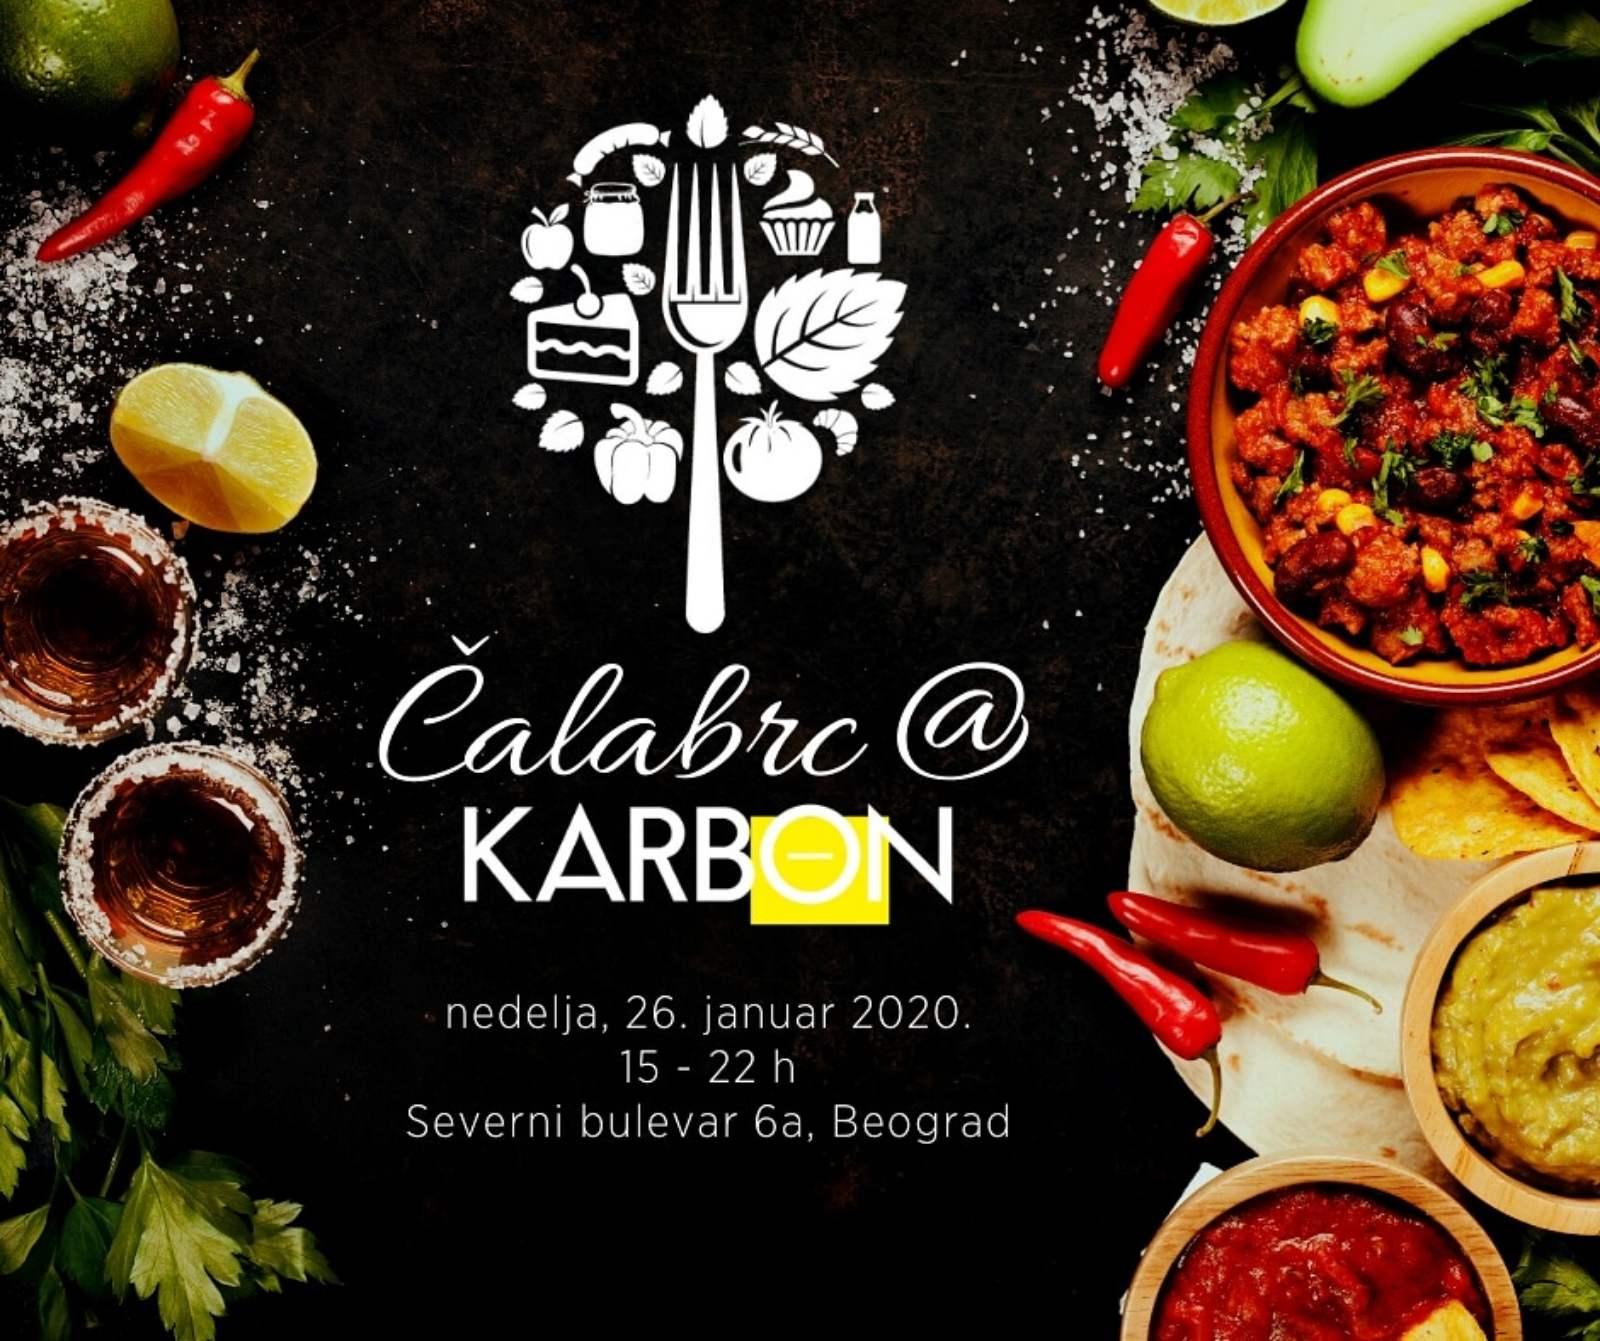 ČALABRC FOOD FEST U BEOGRADU